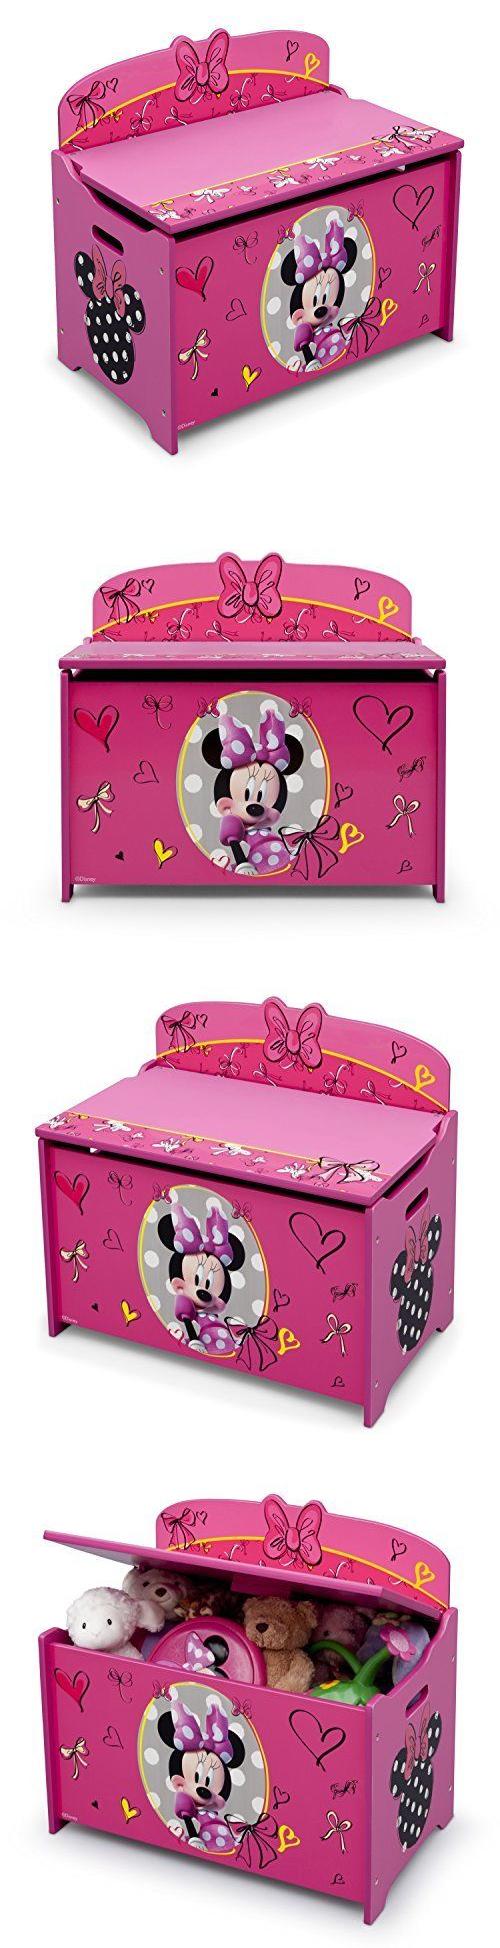 Toy Boxes 94932: Delta Children Deluxe Toy Box, Disney Minnie Mouse Toy  Storage Box